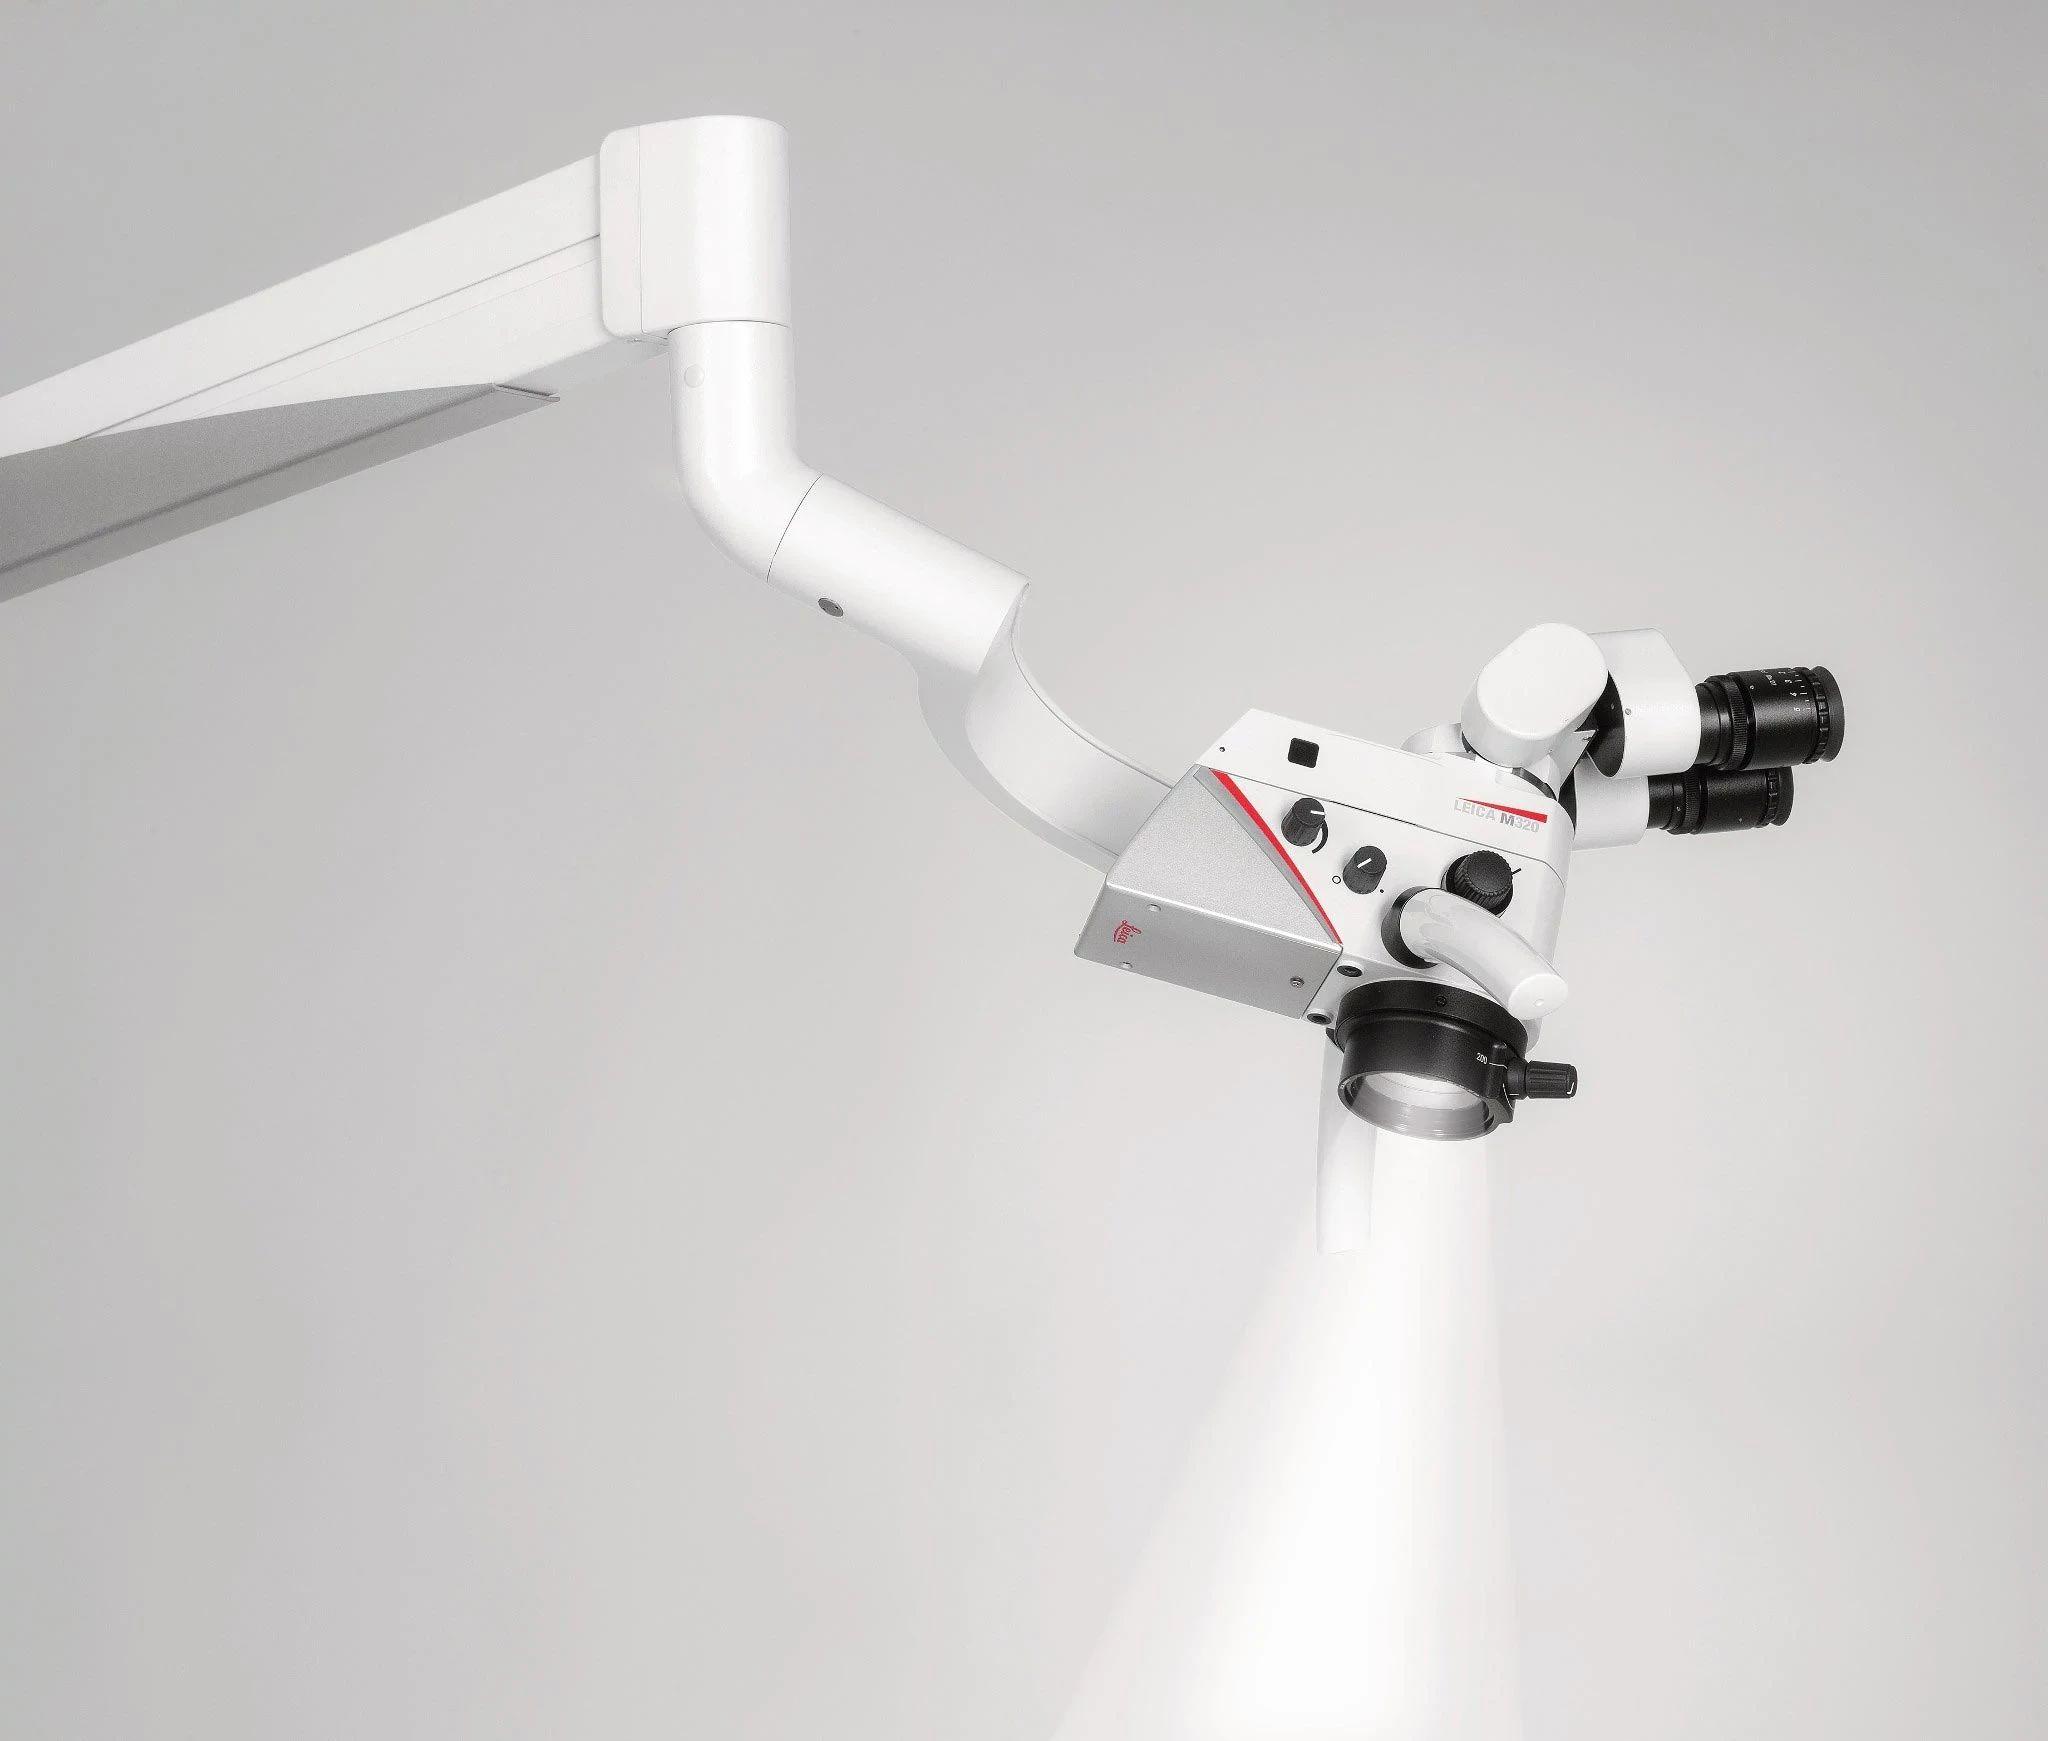 Leica M320 Mikroskop